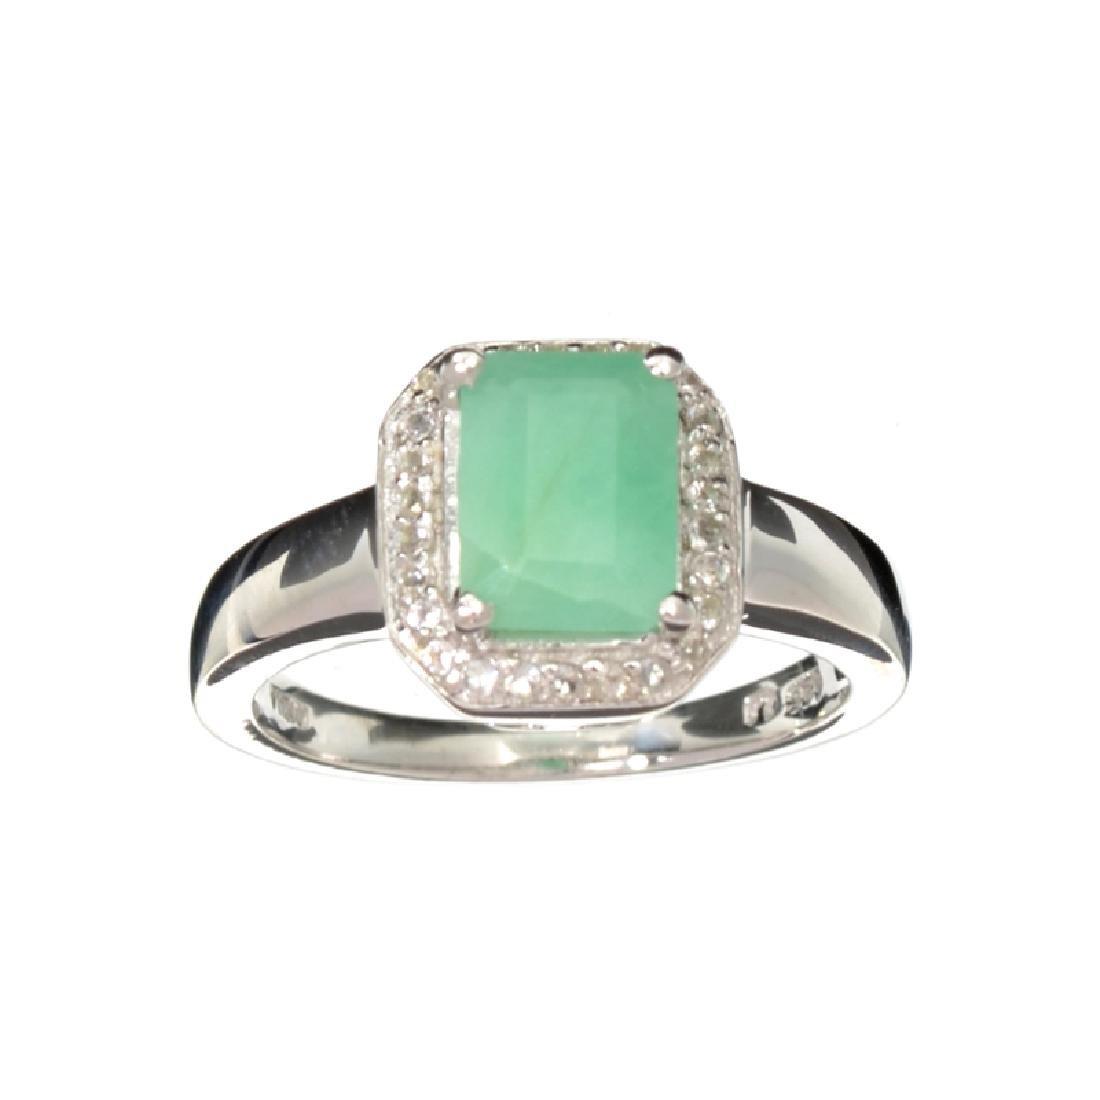 APP: 0.8k Fine Jewelry 1.73CT Green Emerald And White